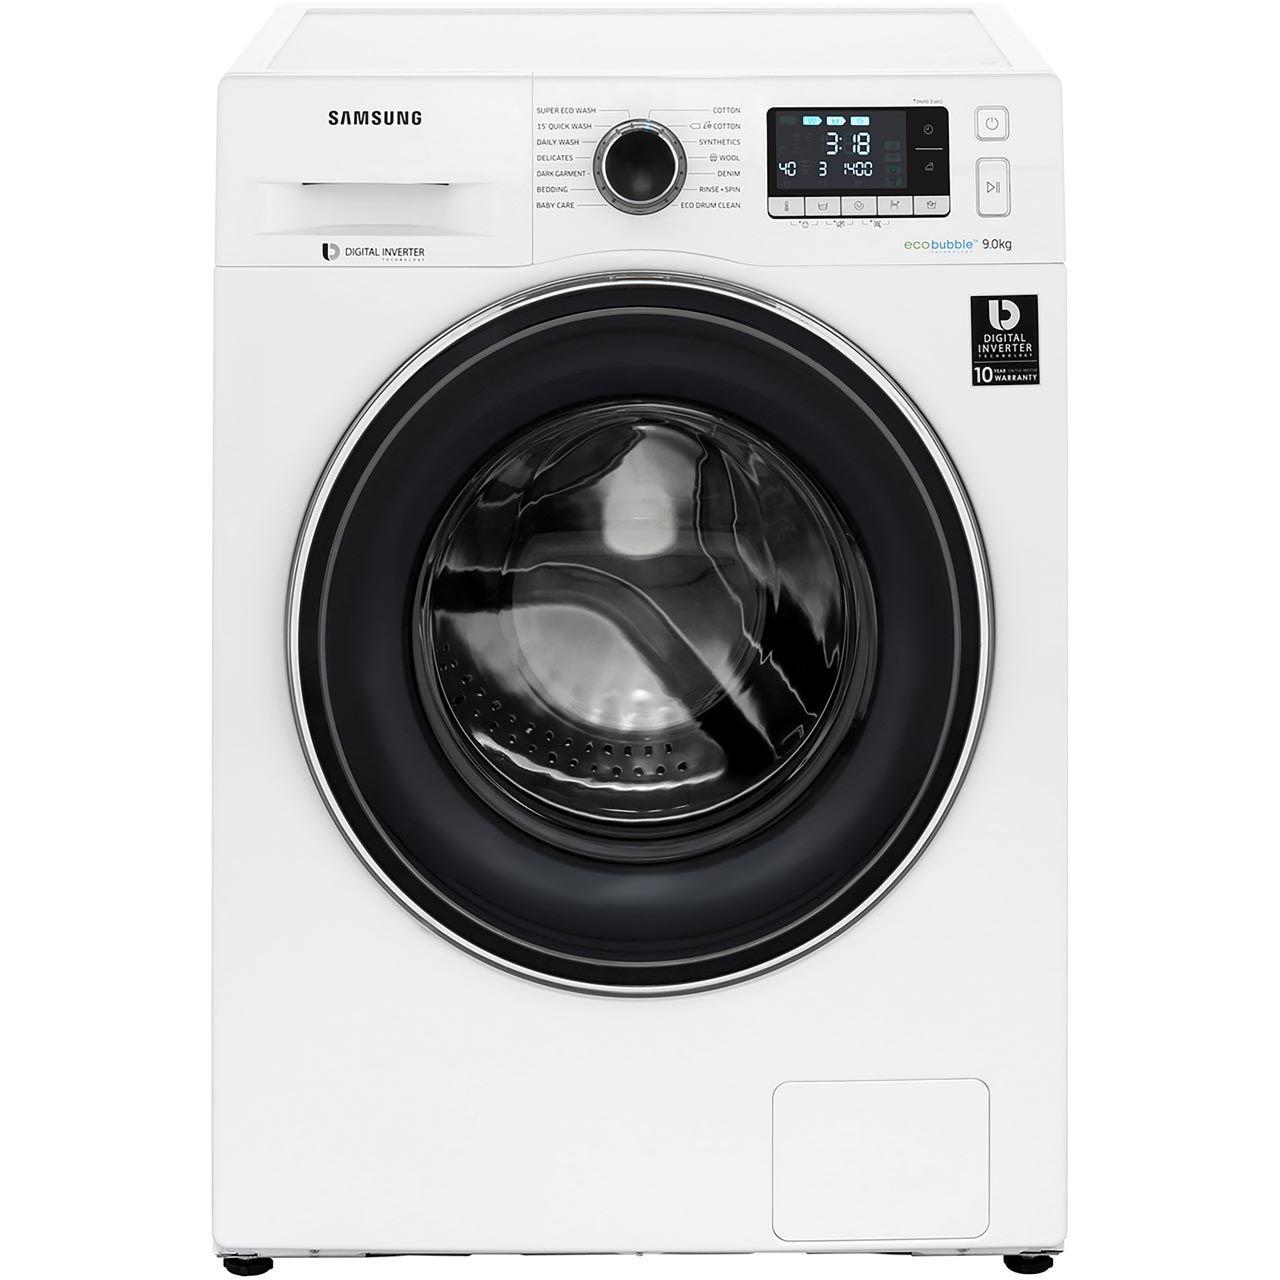 Samsung Ecobubble WW90J5456FW 9Kg Washing Machine with 1400 rpm - White - £359 with code @ ao.com